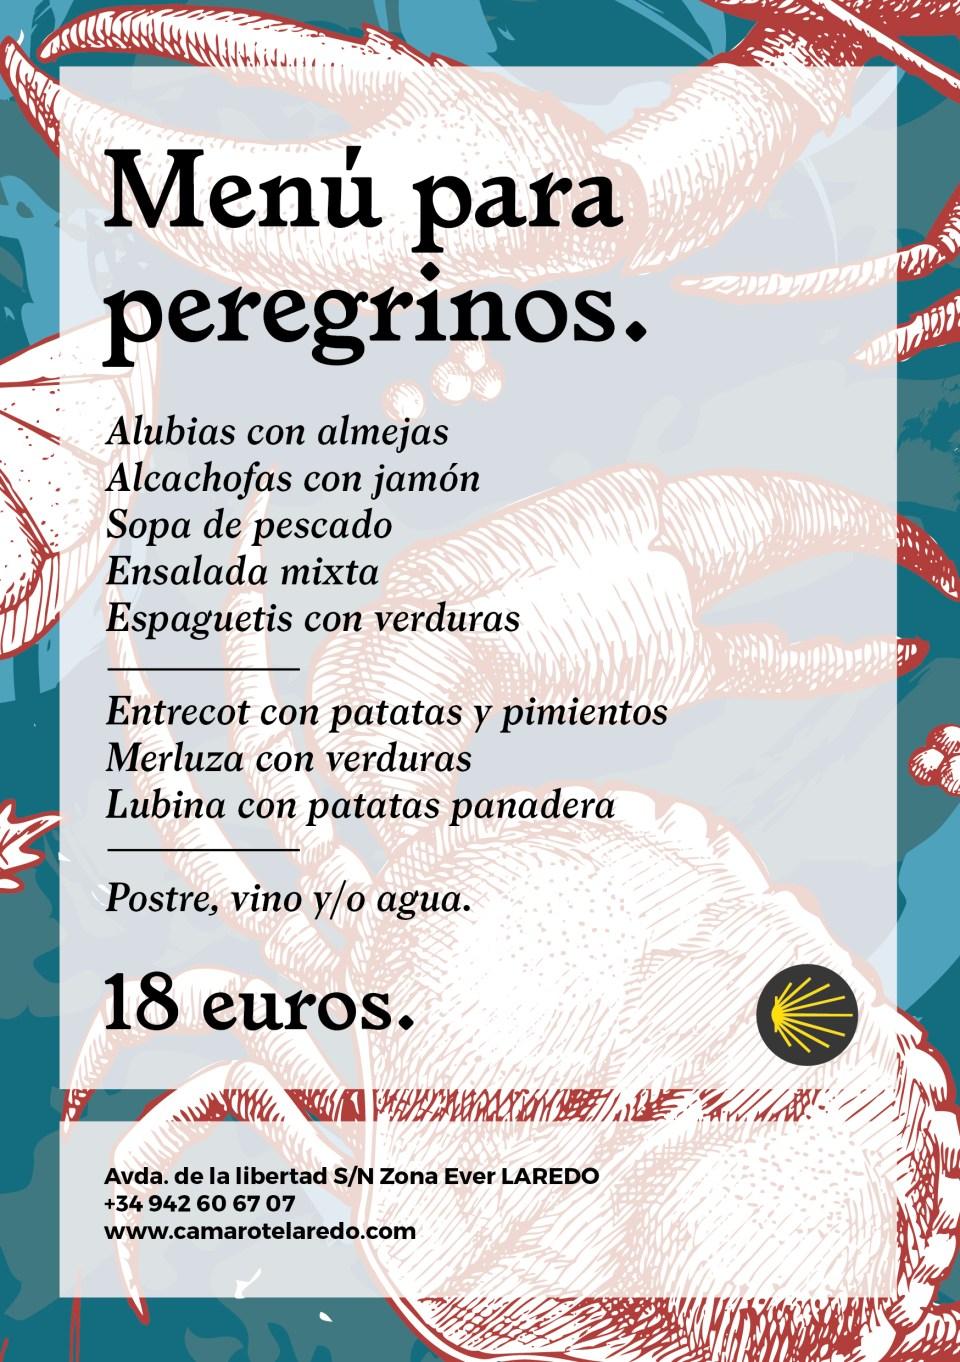 MENU-PEREGRINOS_01-01